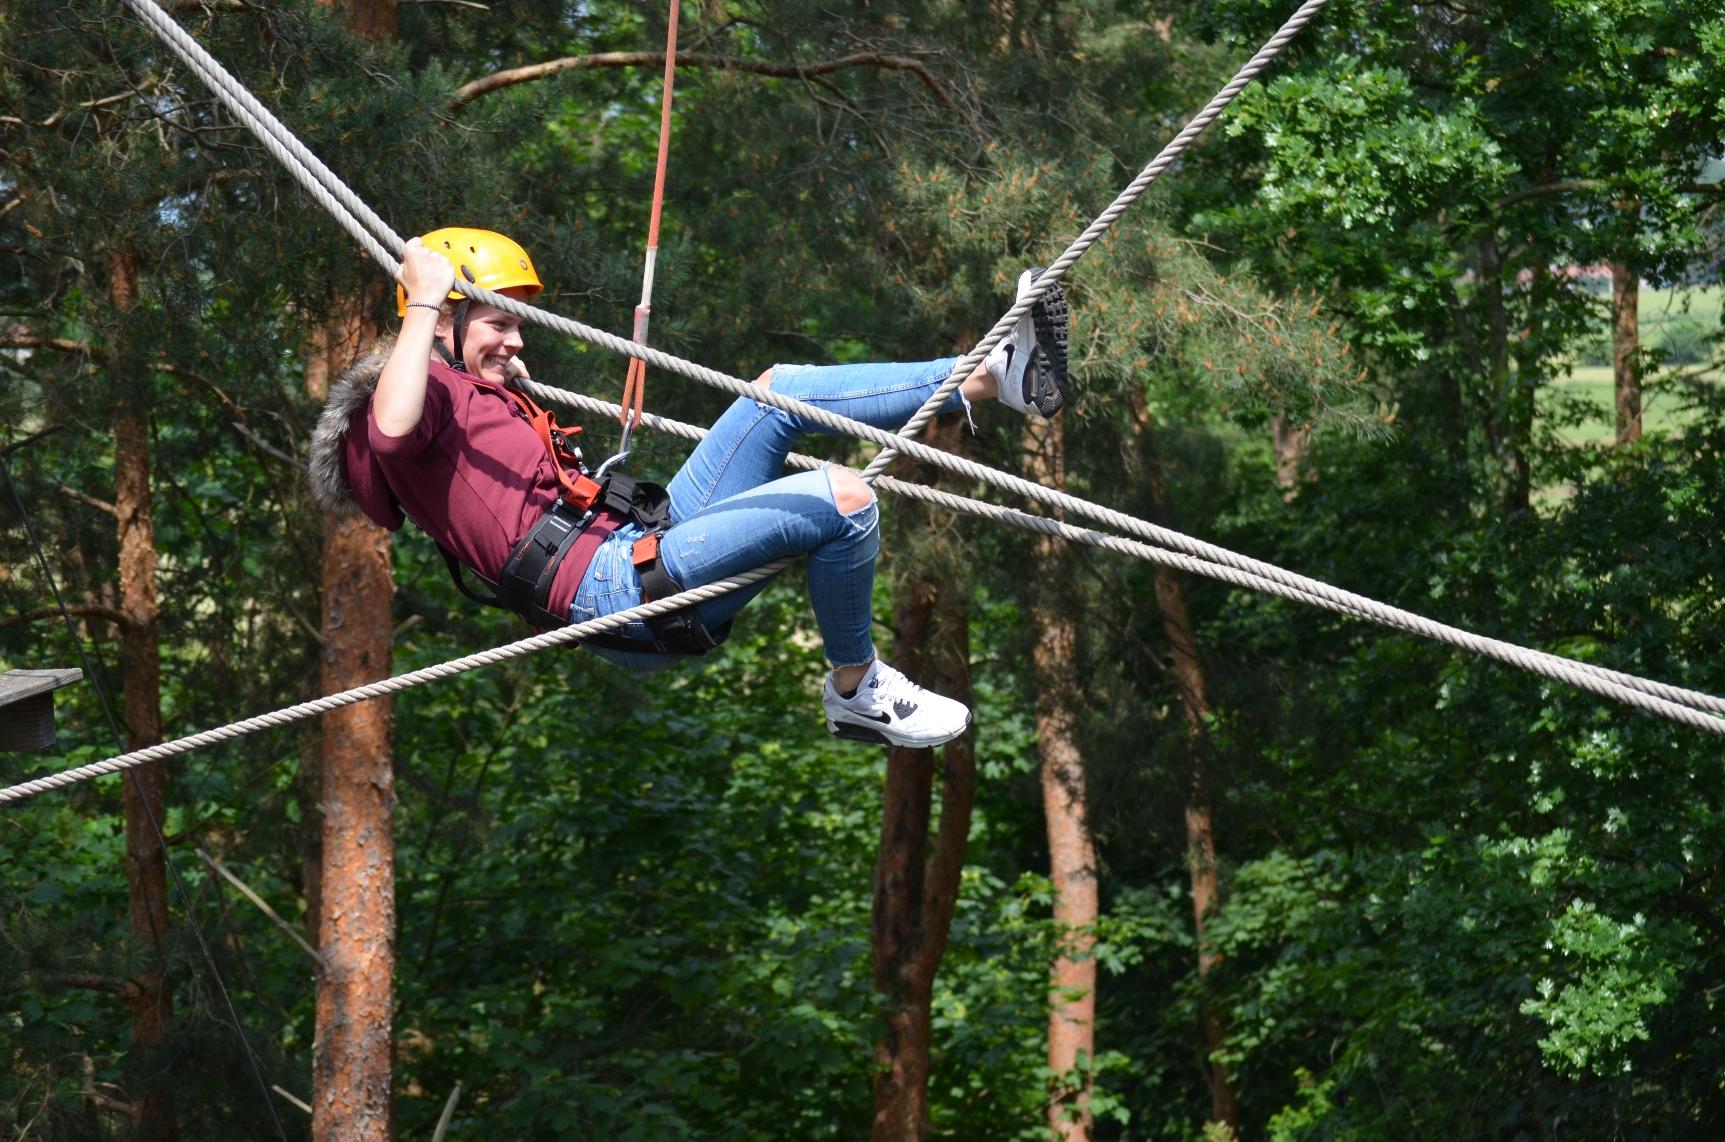 Willkommen schnurstracks Kletterparks Teambuilding Outdoor-Aktionen